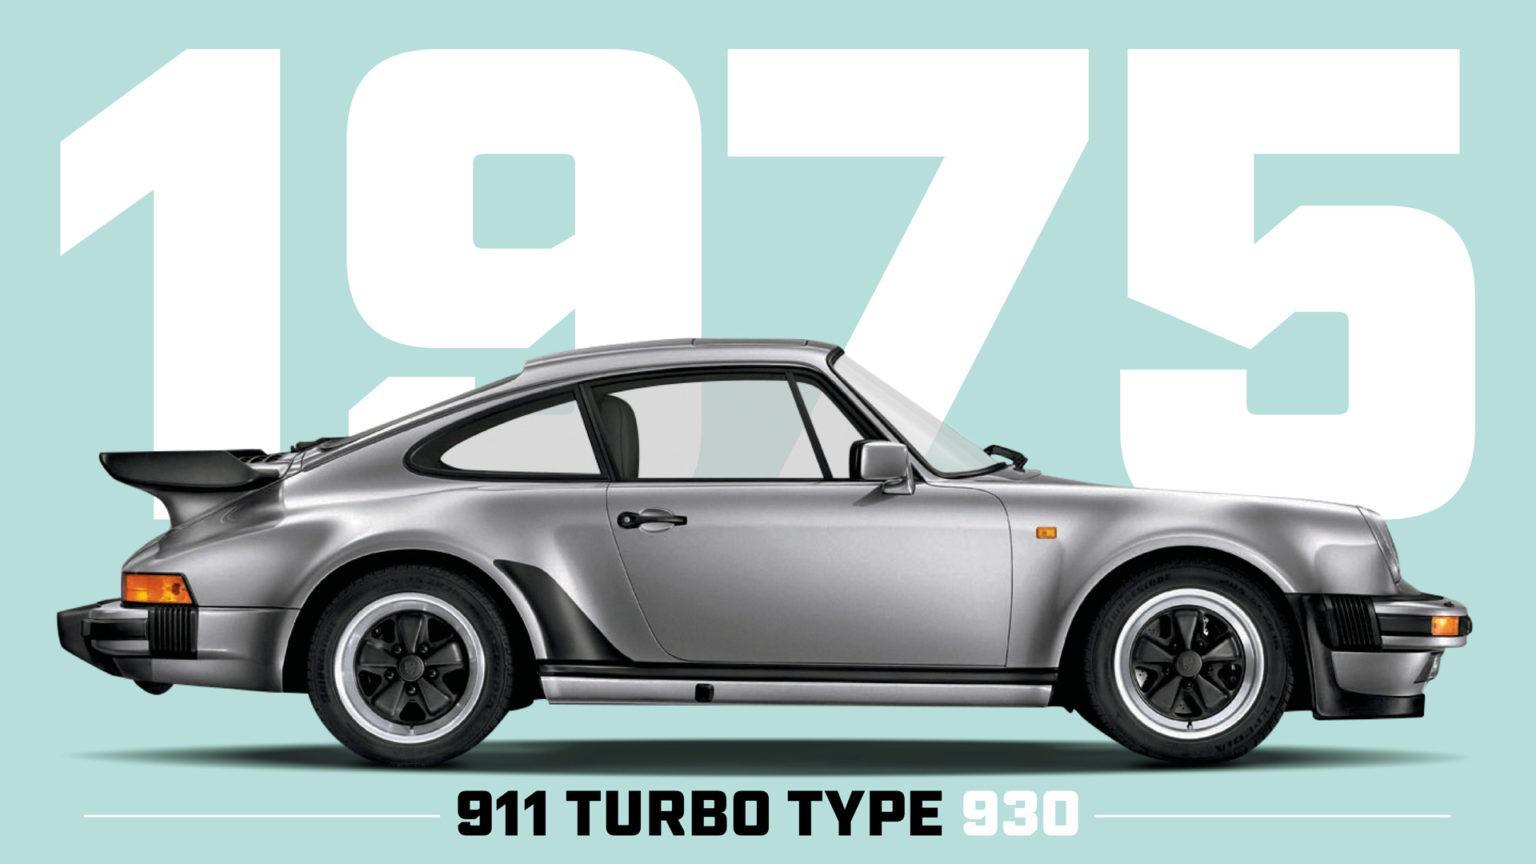 la-saga-porsche-911-turbo-le-guide-d-achat-1349-1.jpg